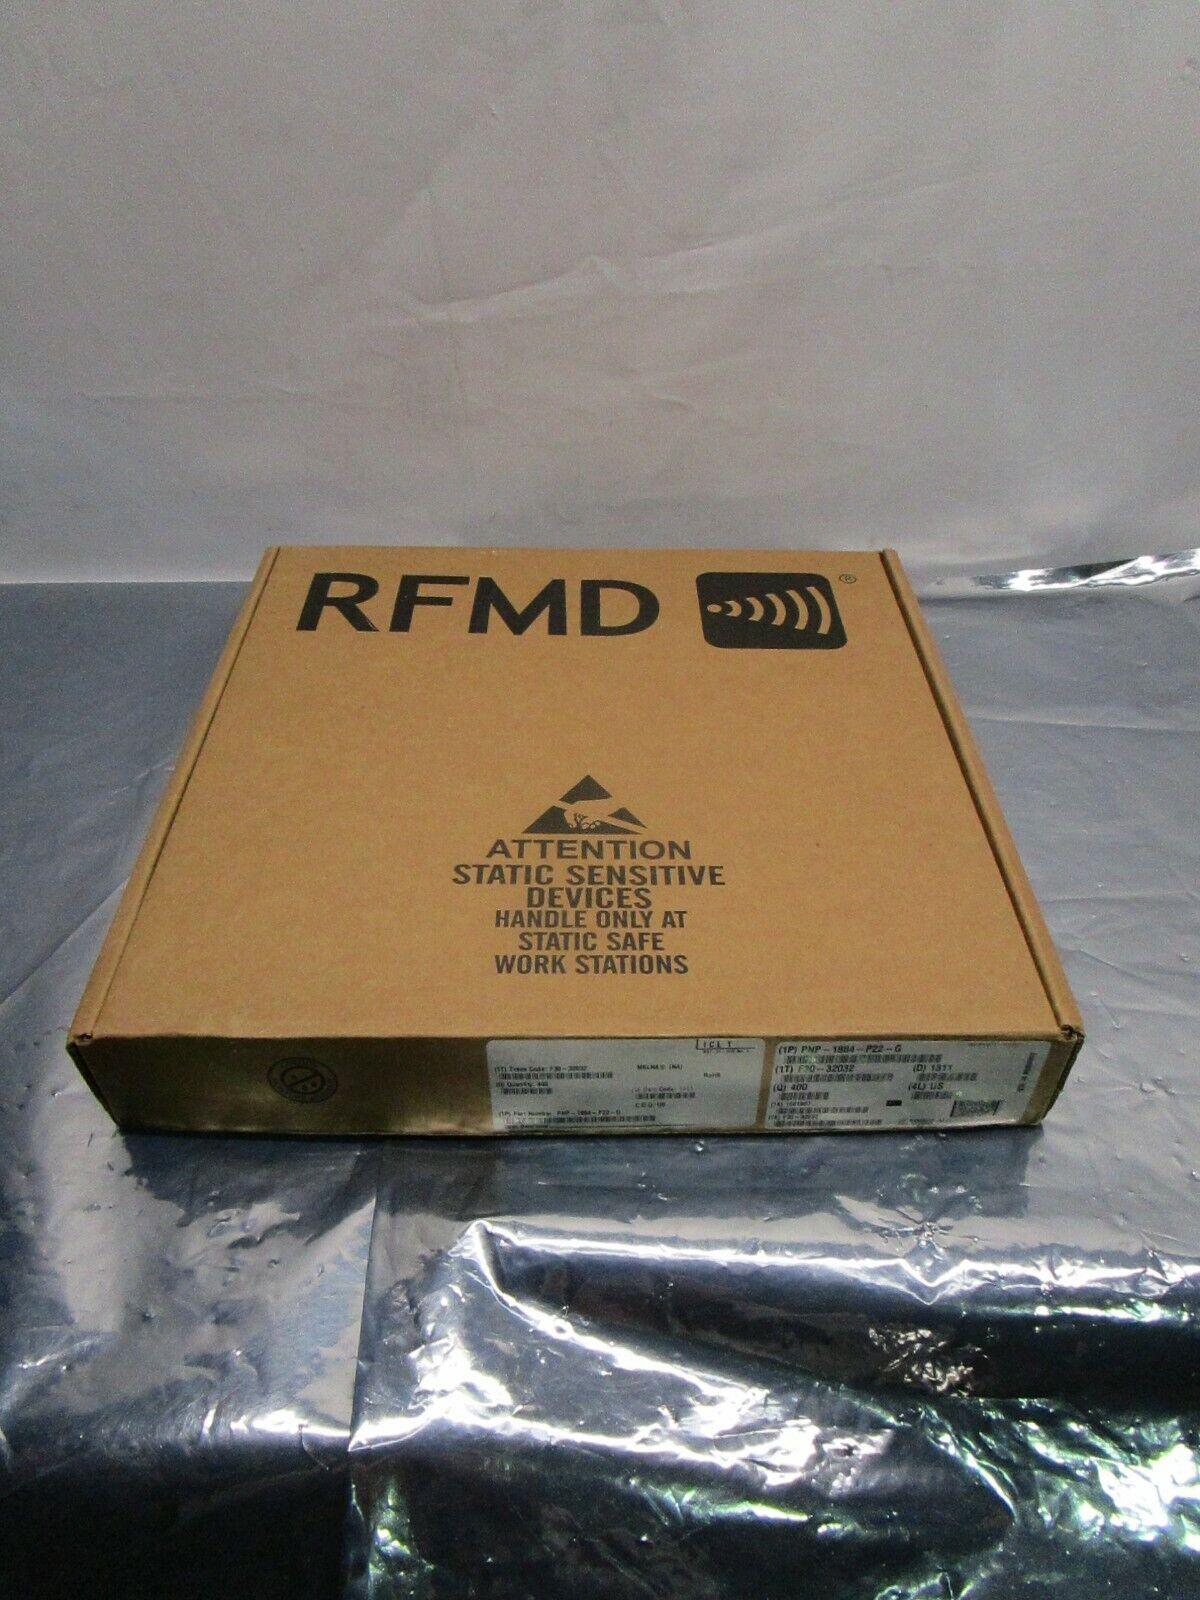 1 Lot of 400 RFMD QORVO PNP-1884-P22-G SYNTHESIZER 1700-2000 MHZ, 102656